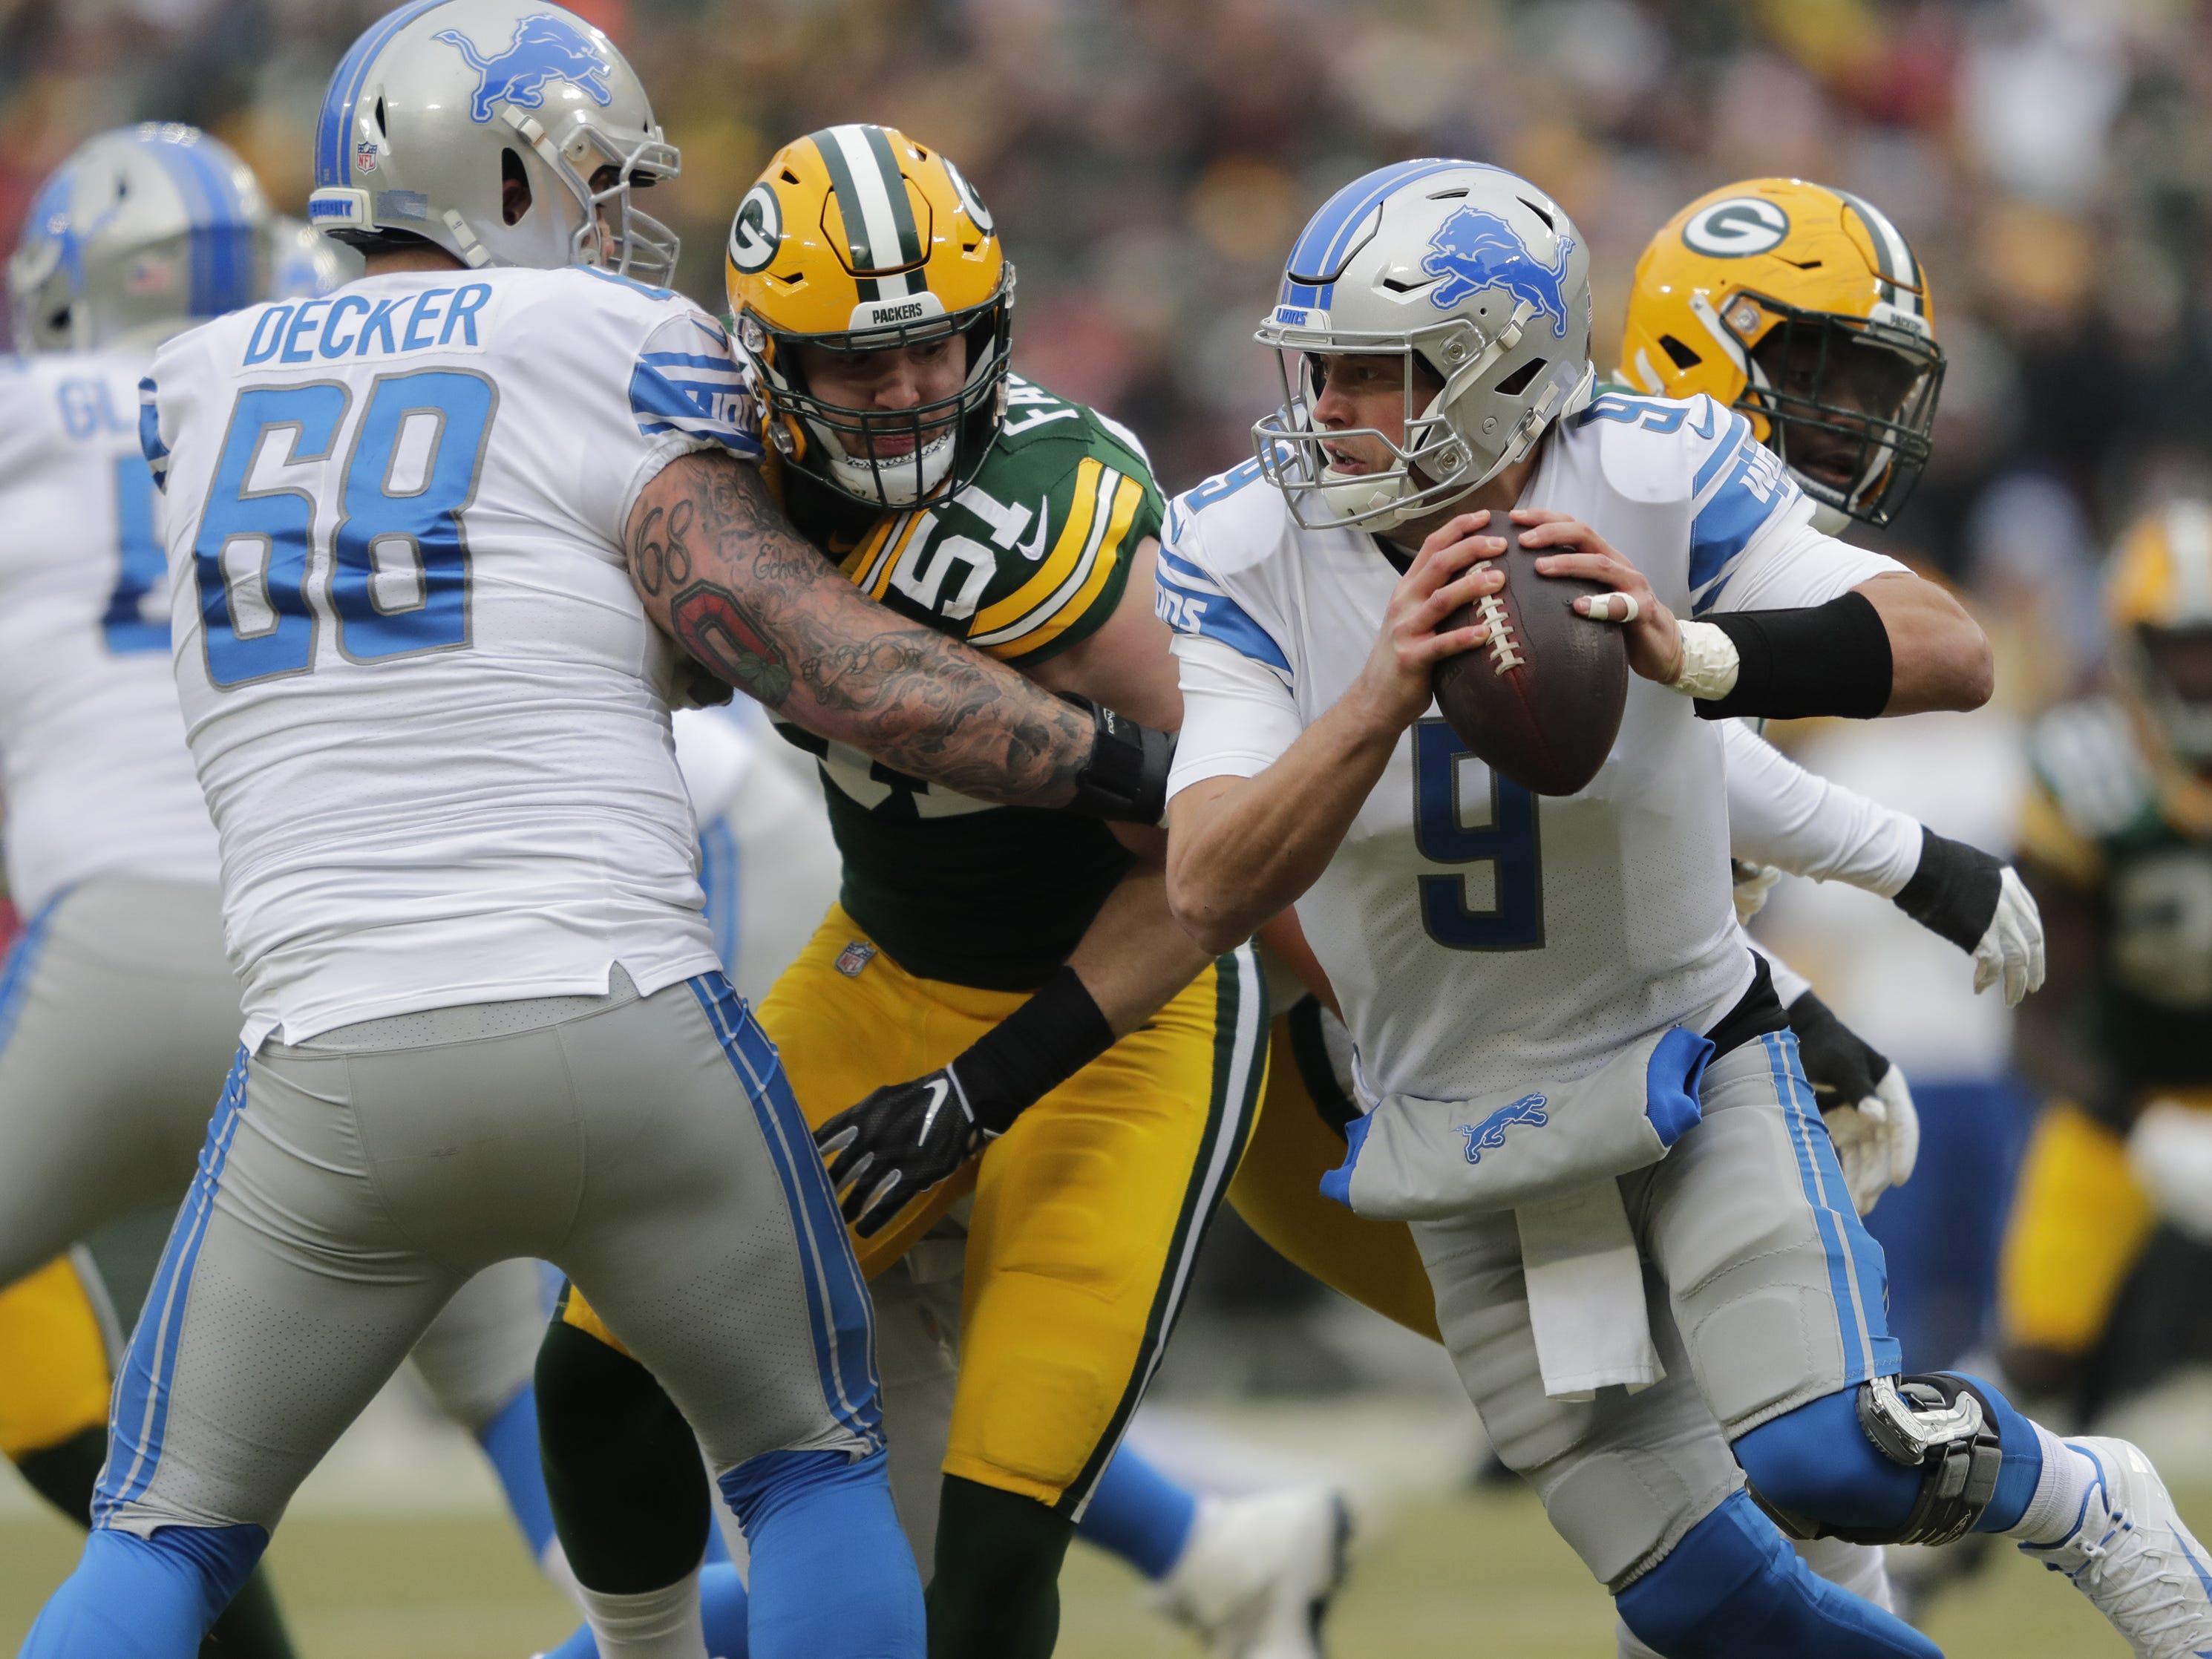 Detroit Lions quarterback Matthew Stafford (9) scrambles away from Green Bay Packers linebacker Kyler Fackrell (51) in the first half Sunday, December 30, 2018, at Lambeau Field in Green Bay, Wis.  Dan Powers/USA TODAY NETWORK-Wisconsin